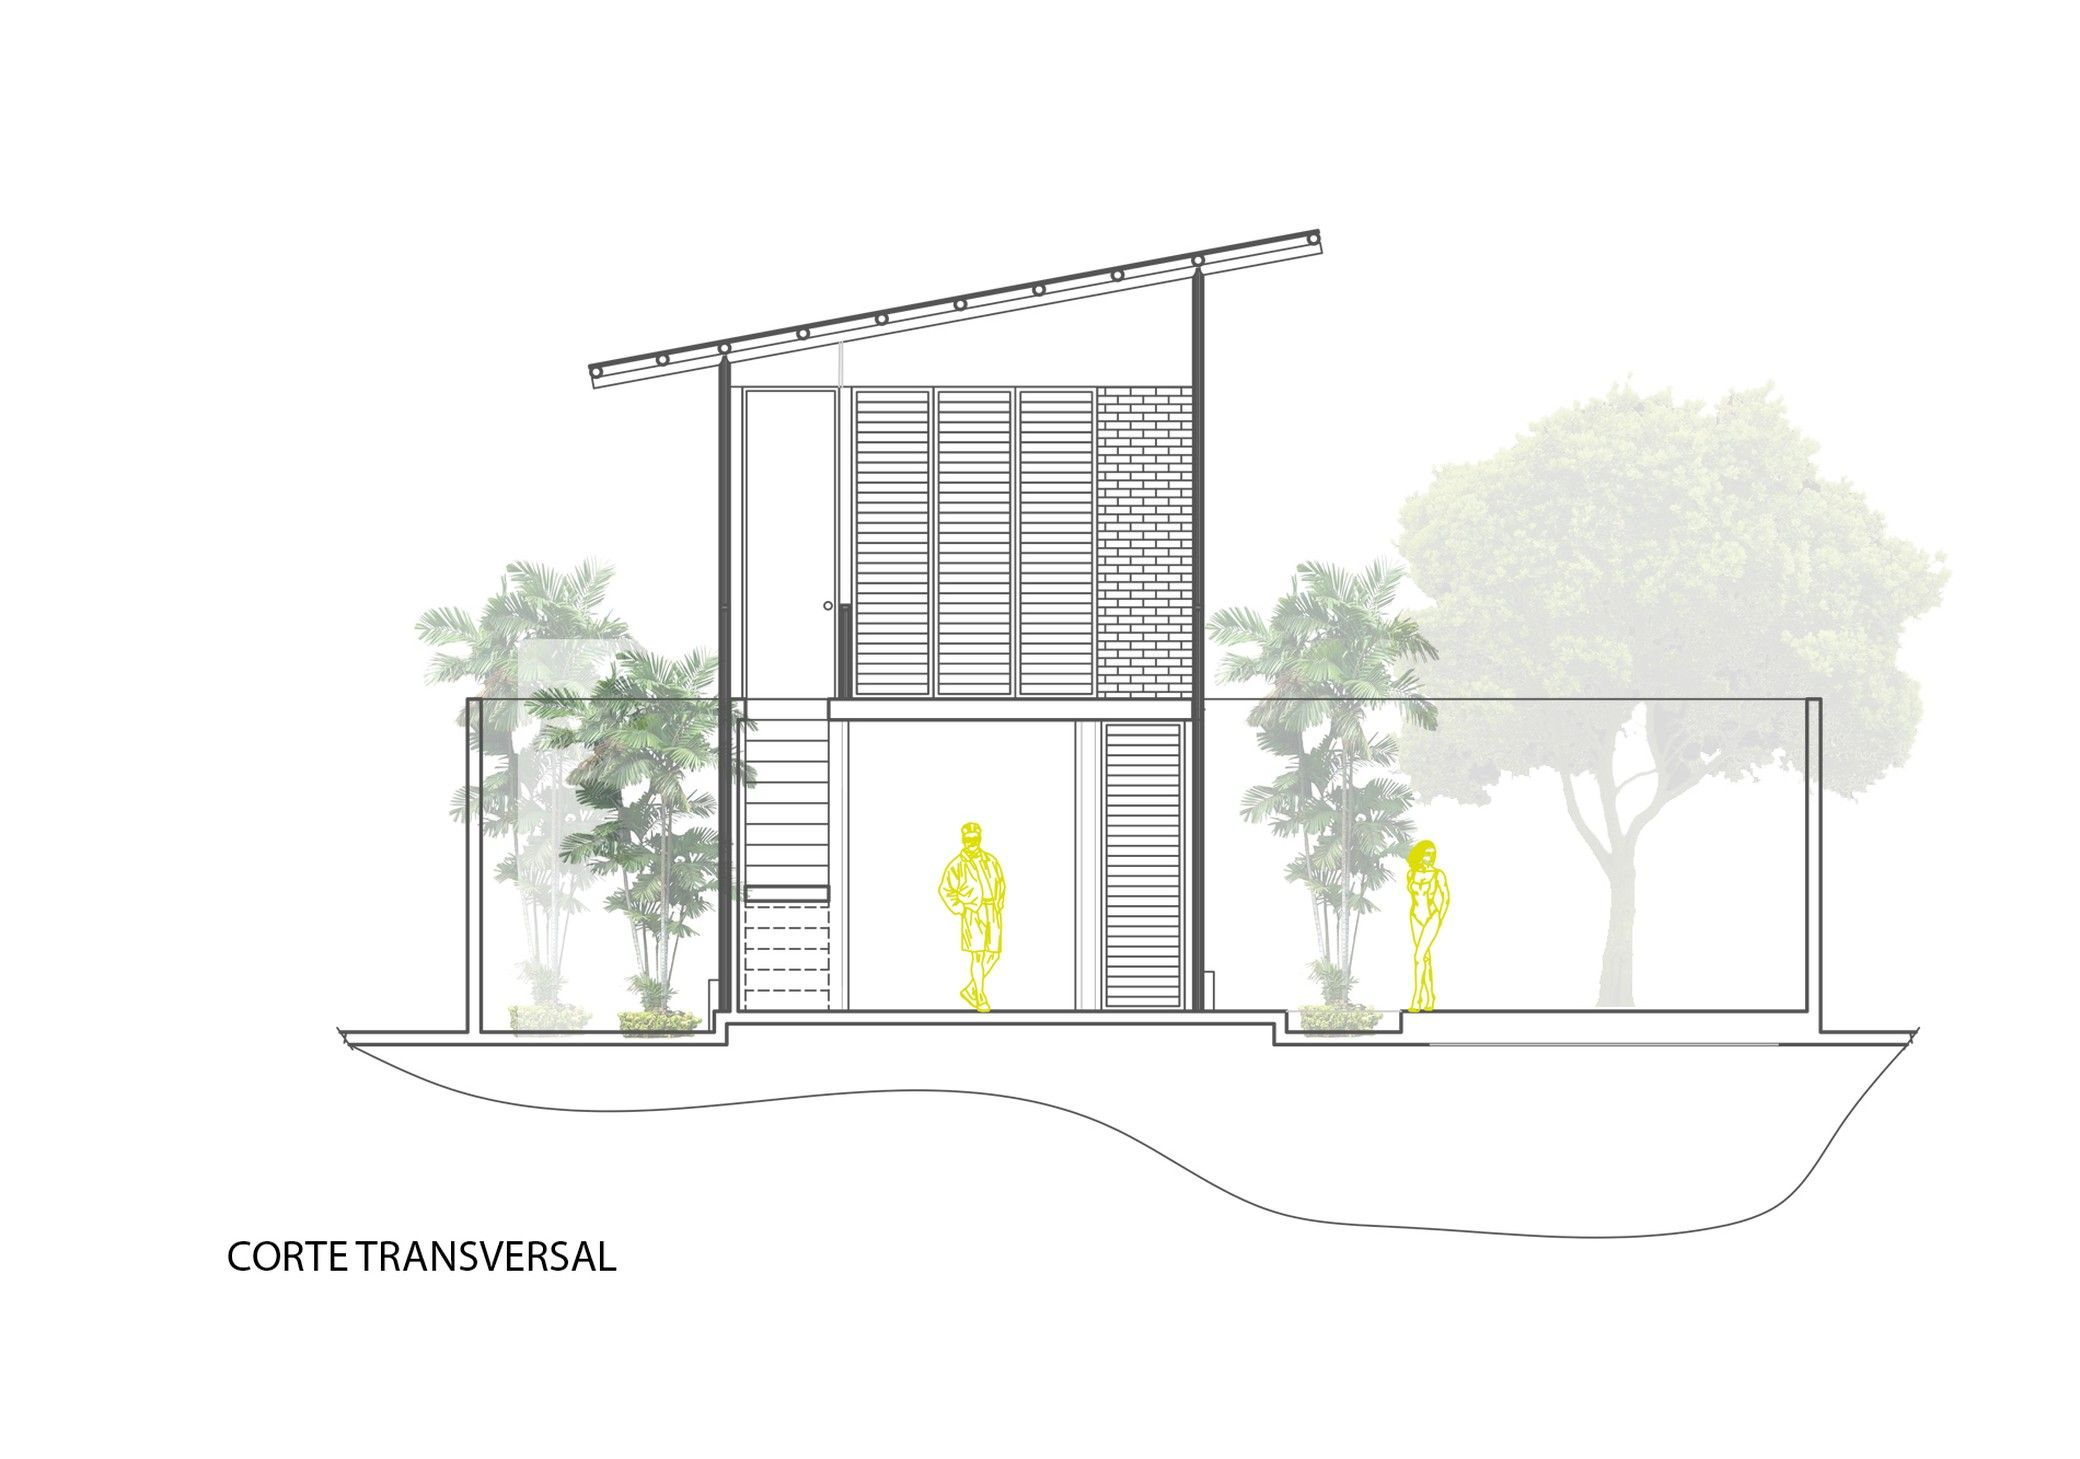 Stilt house natura futura arquitectura australia brick dwelling ecuador glass inhabitant jagstudio naturafuturaarquitectura stilthouse